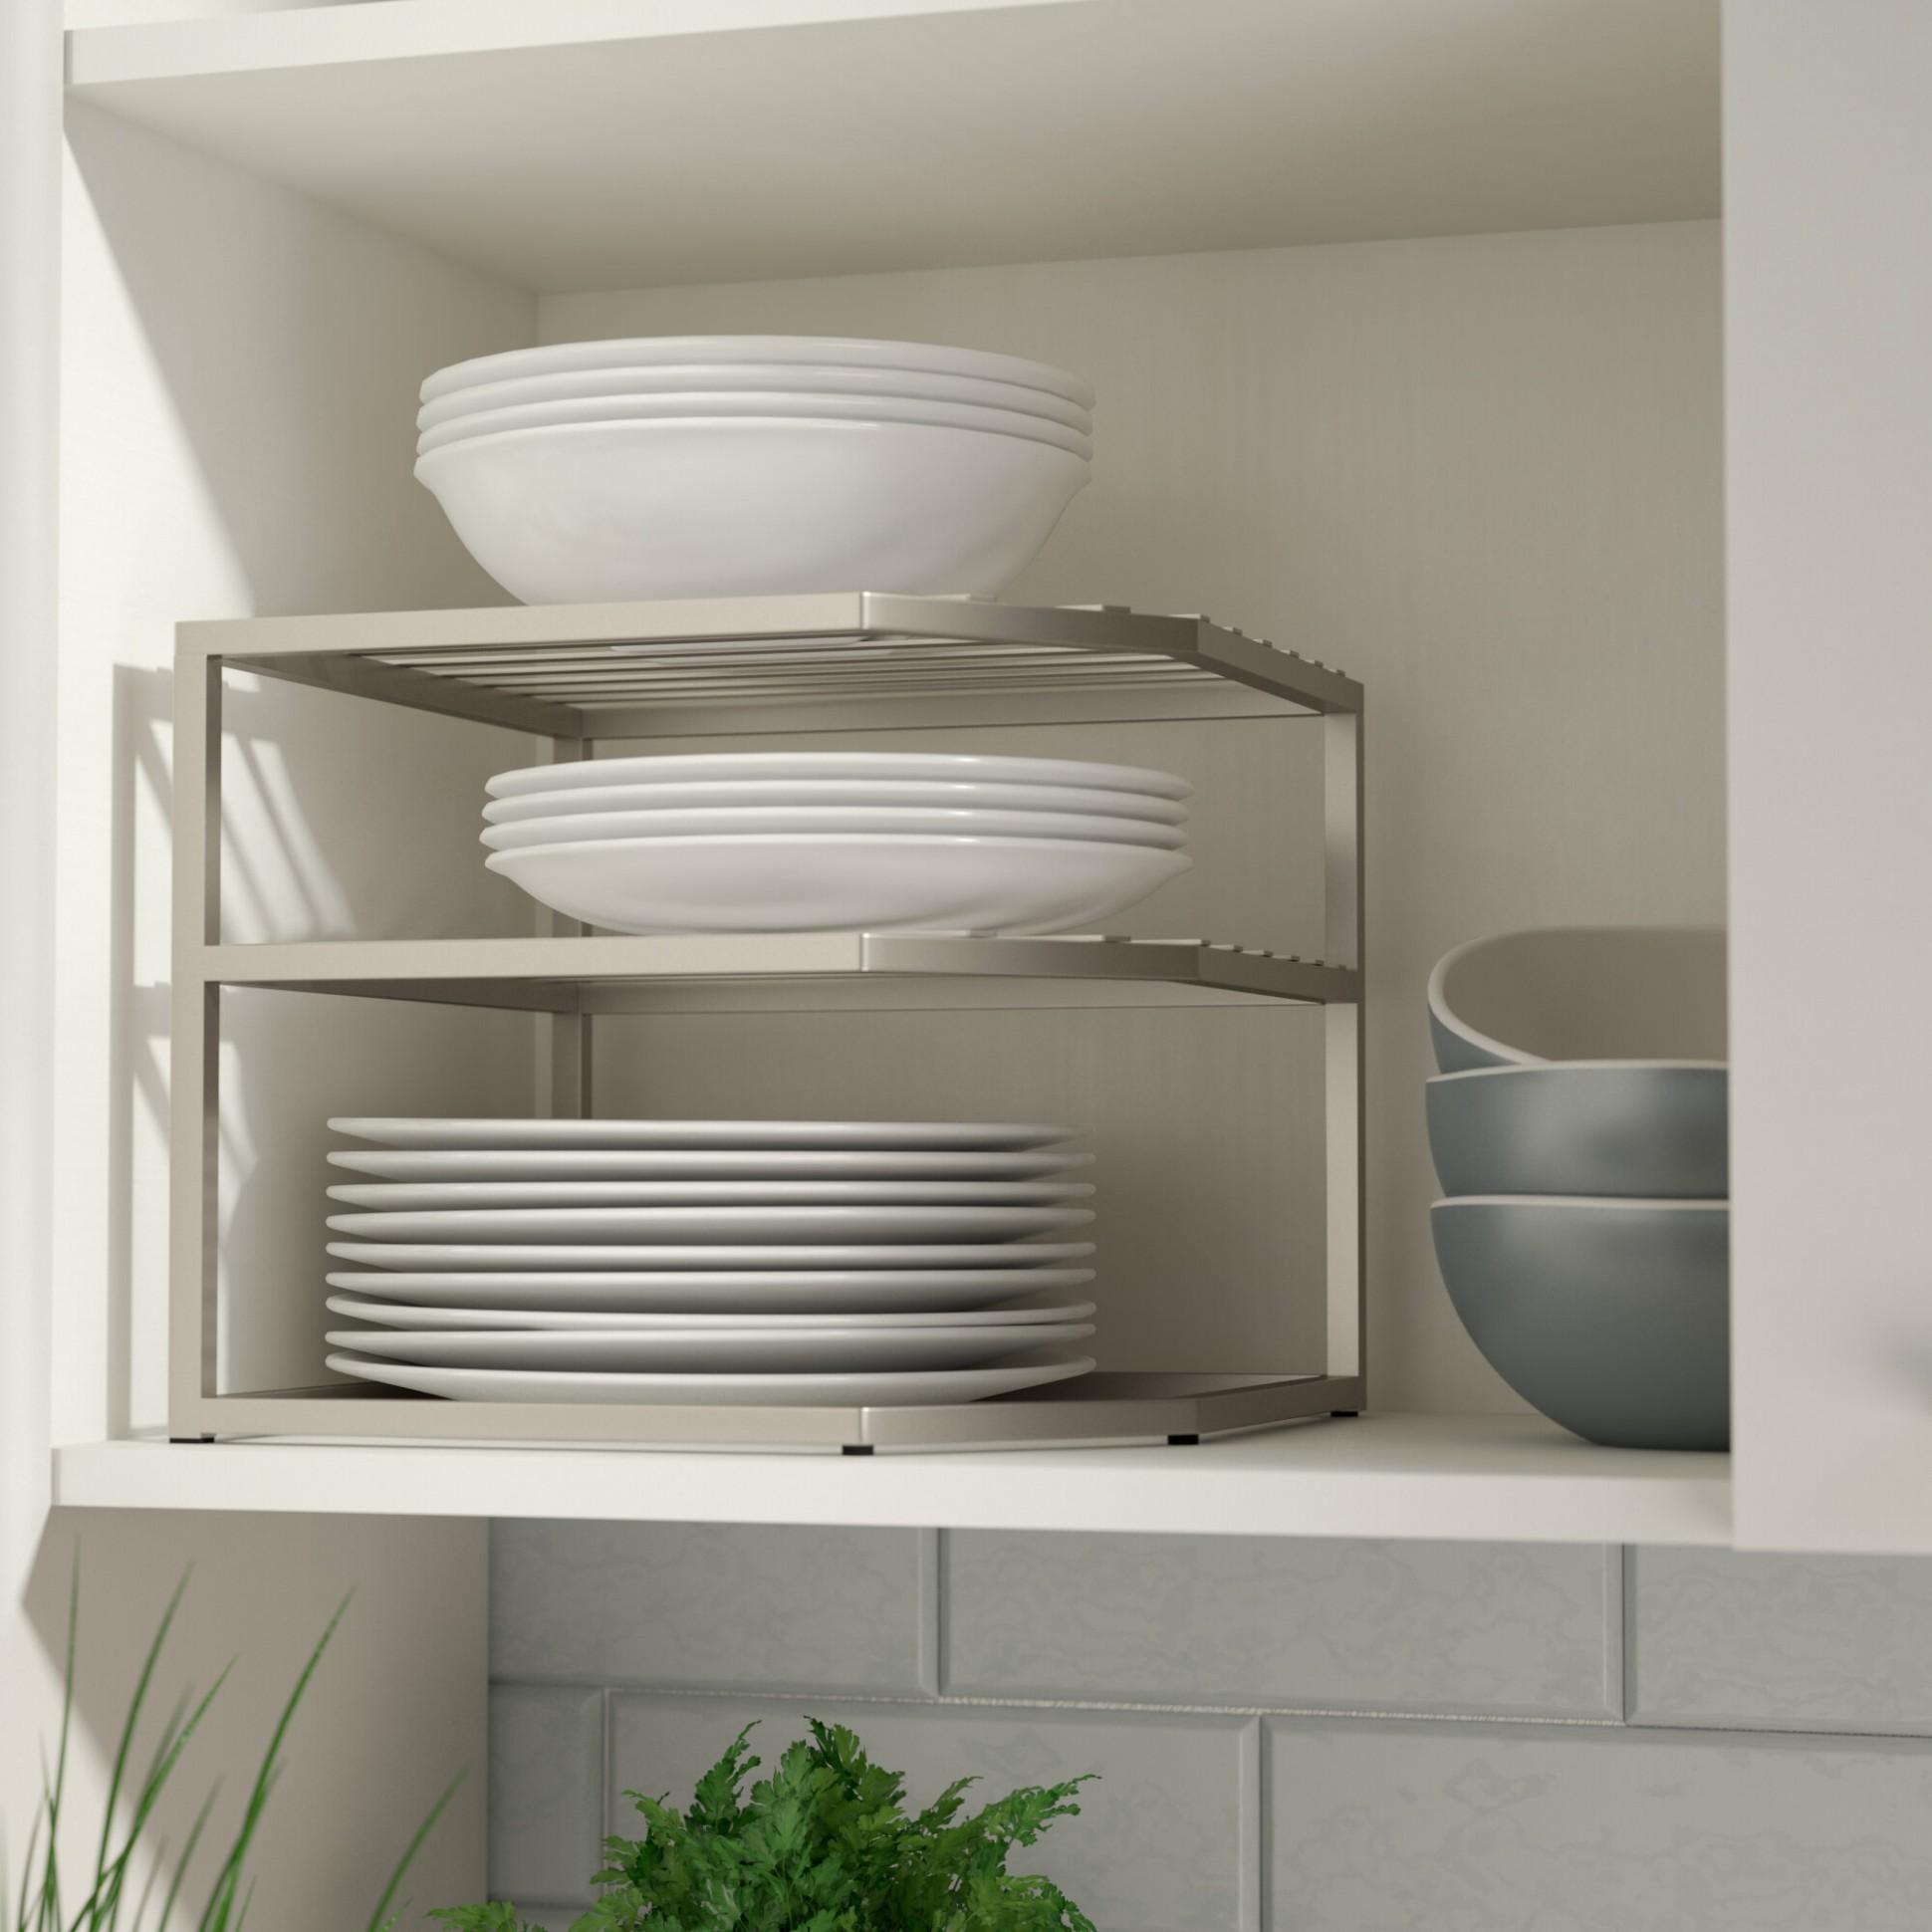 Prevatte Corner Kitchen Cabinet Organizer Shelving Rack - 26 X10